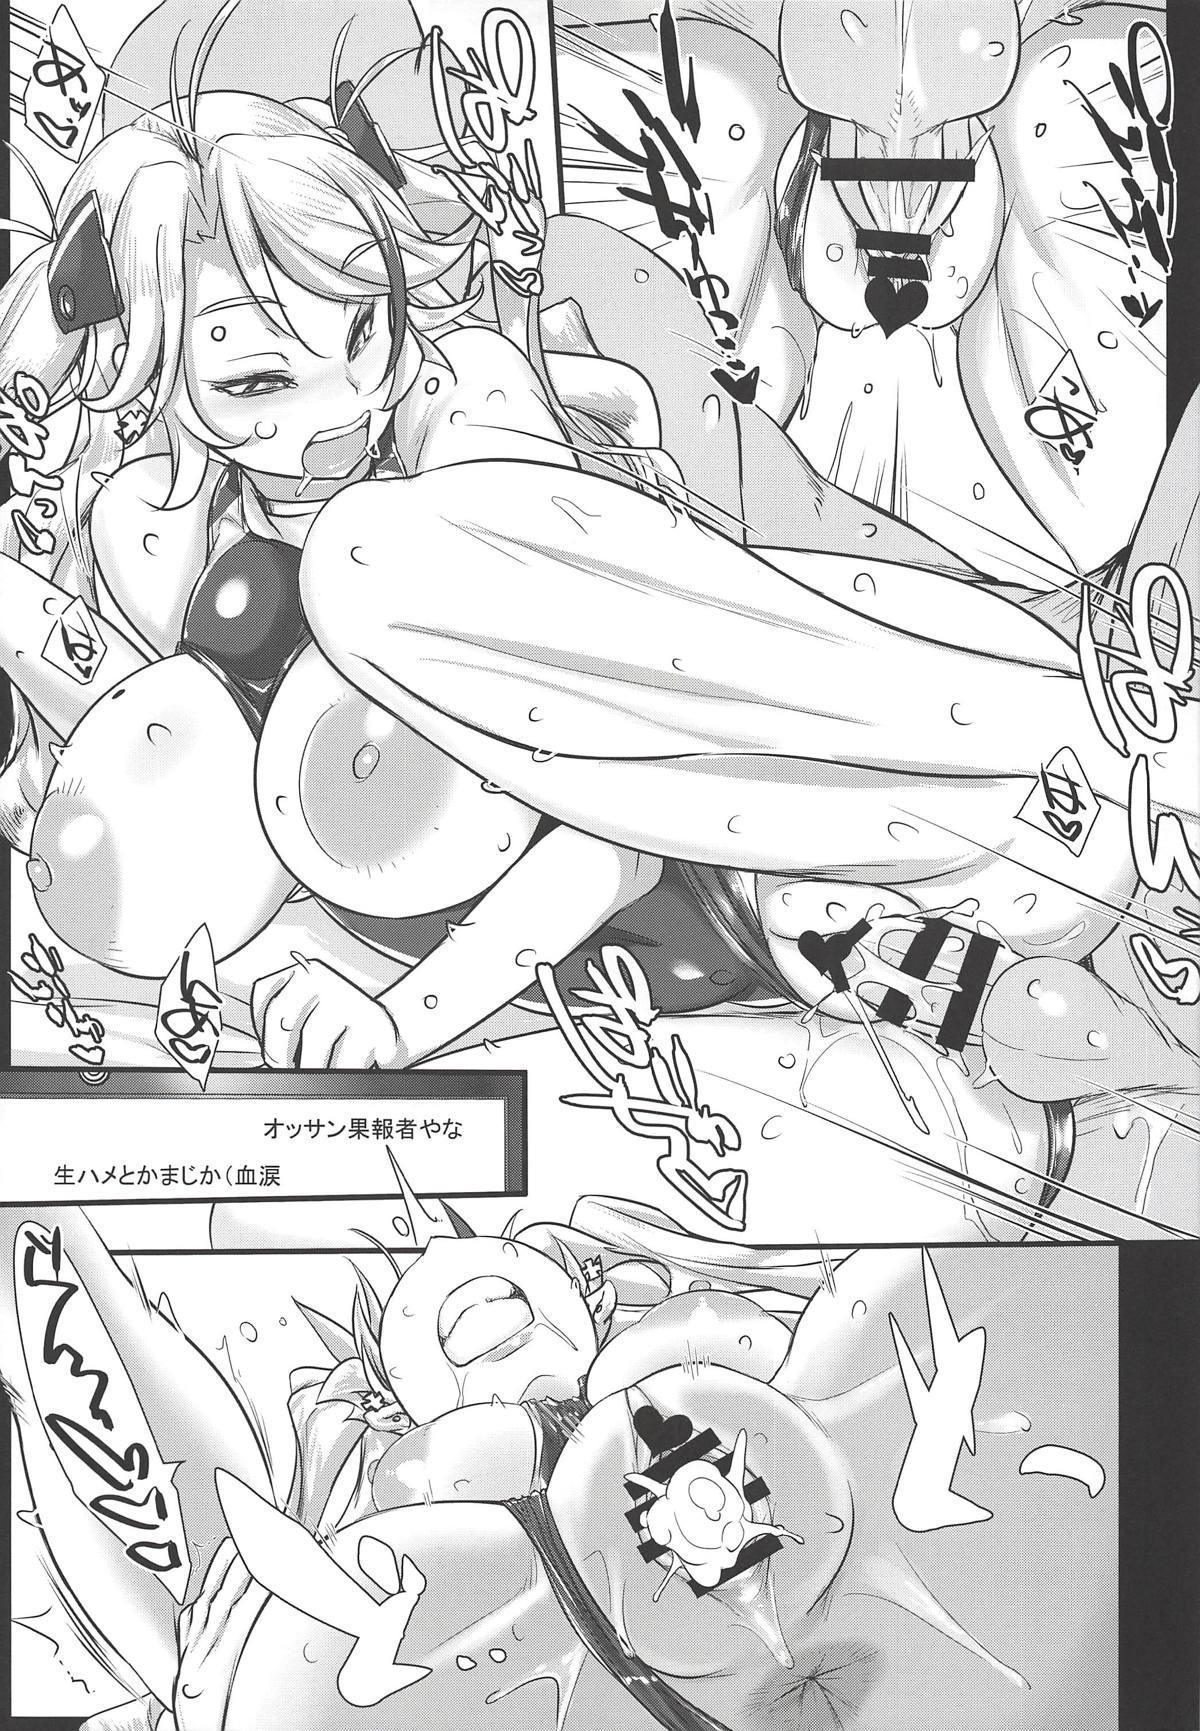 POV pert babe, Prinz Eugen. - Juujun Musume Hamedori Jikkyou Report 11